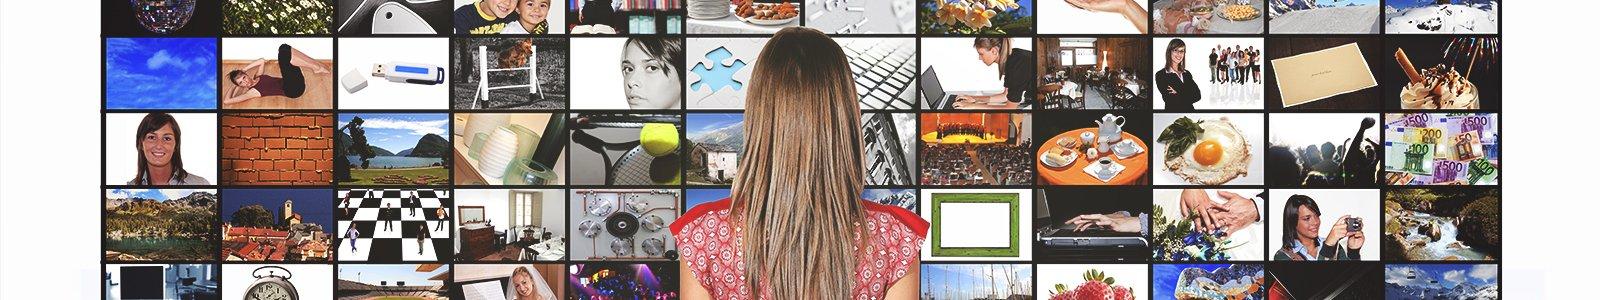 Televisieschermen © iStockphoto.com/marcoscisetti